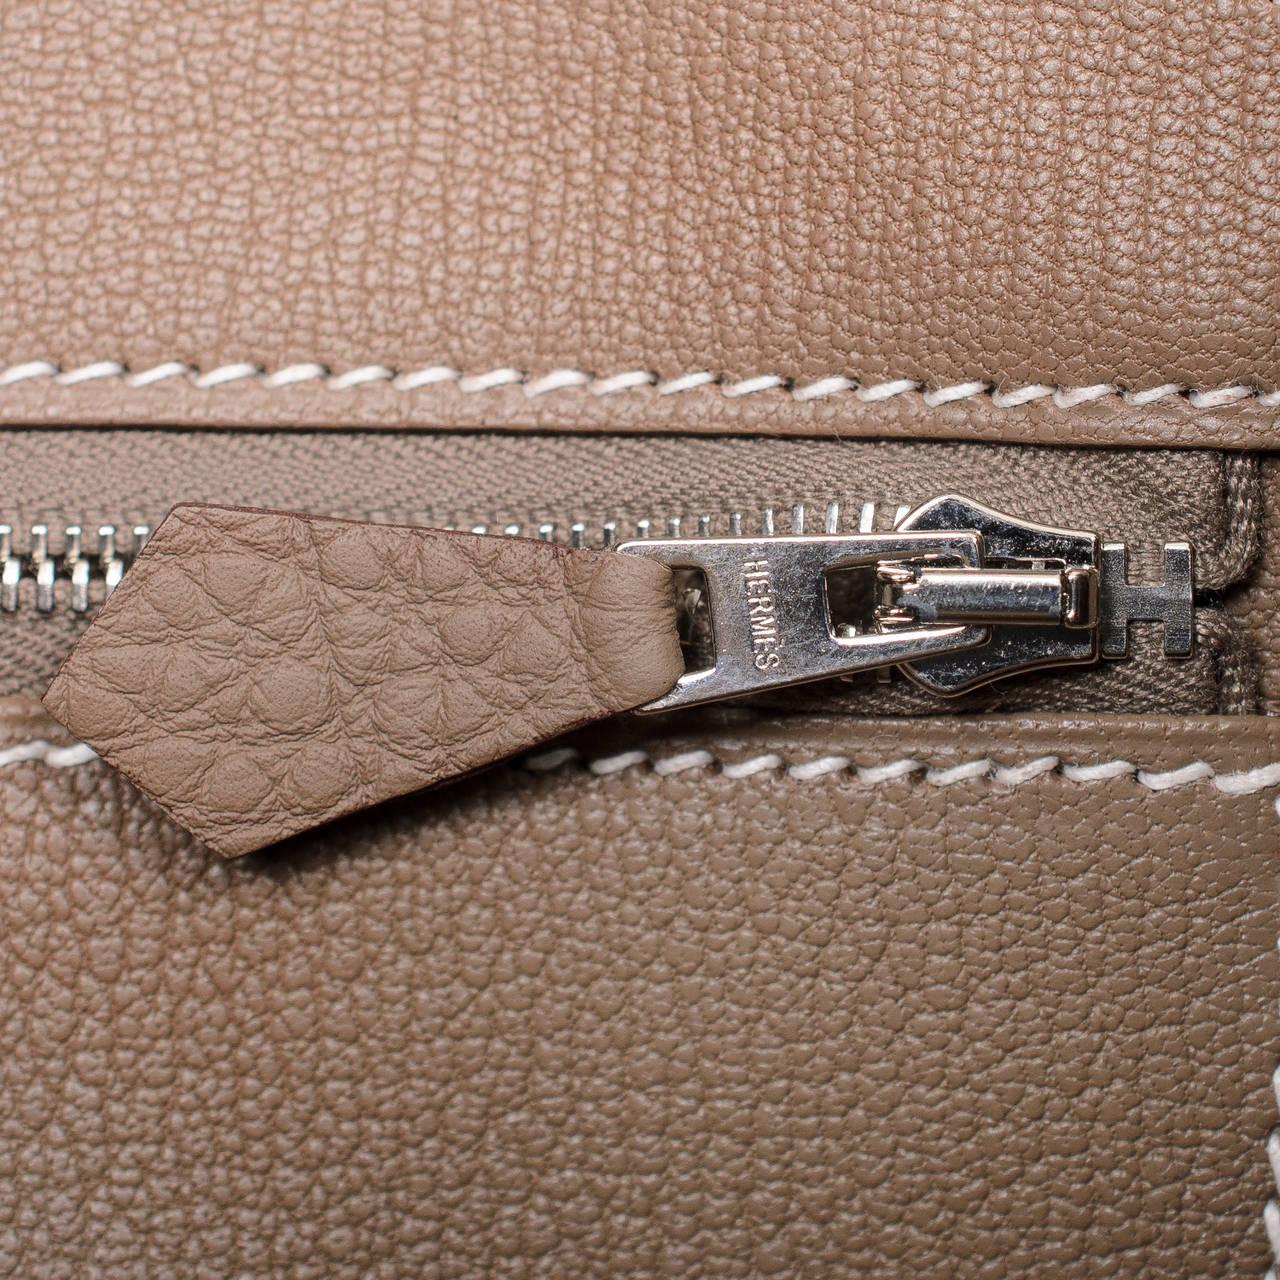 hermes birkin knock off - Hermes Etoupe Togo Birkin 35cm Palladium Hardware at 1stdibs